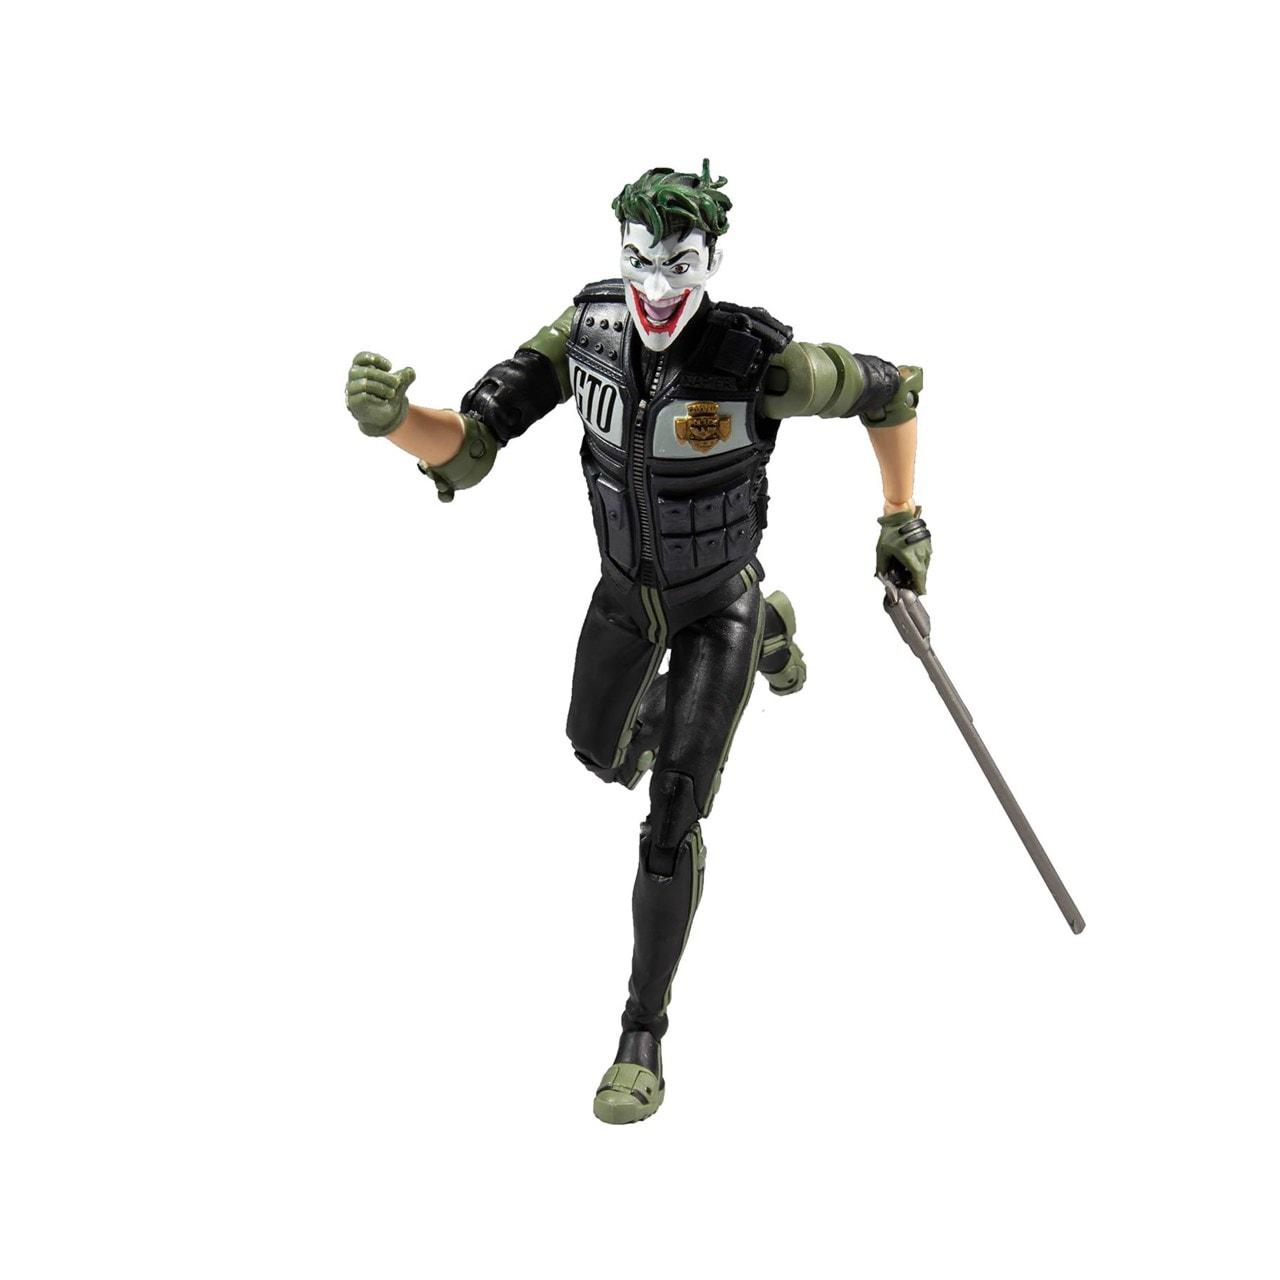 White Knight: Joker (DC Multiverse) Action Figure - 3